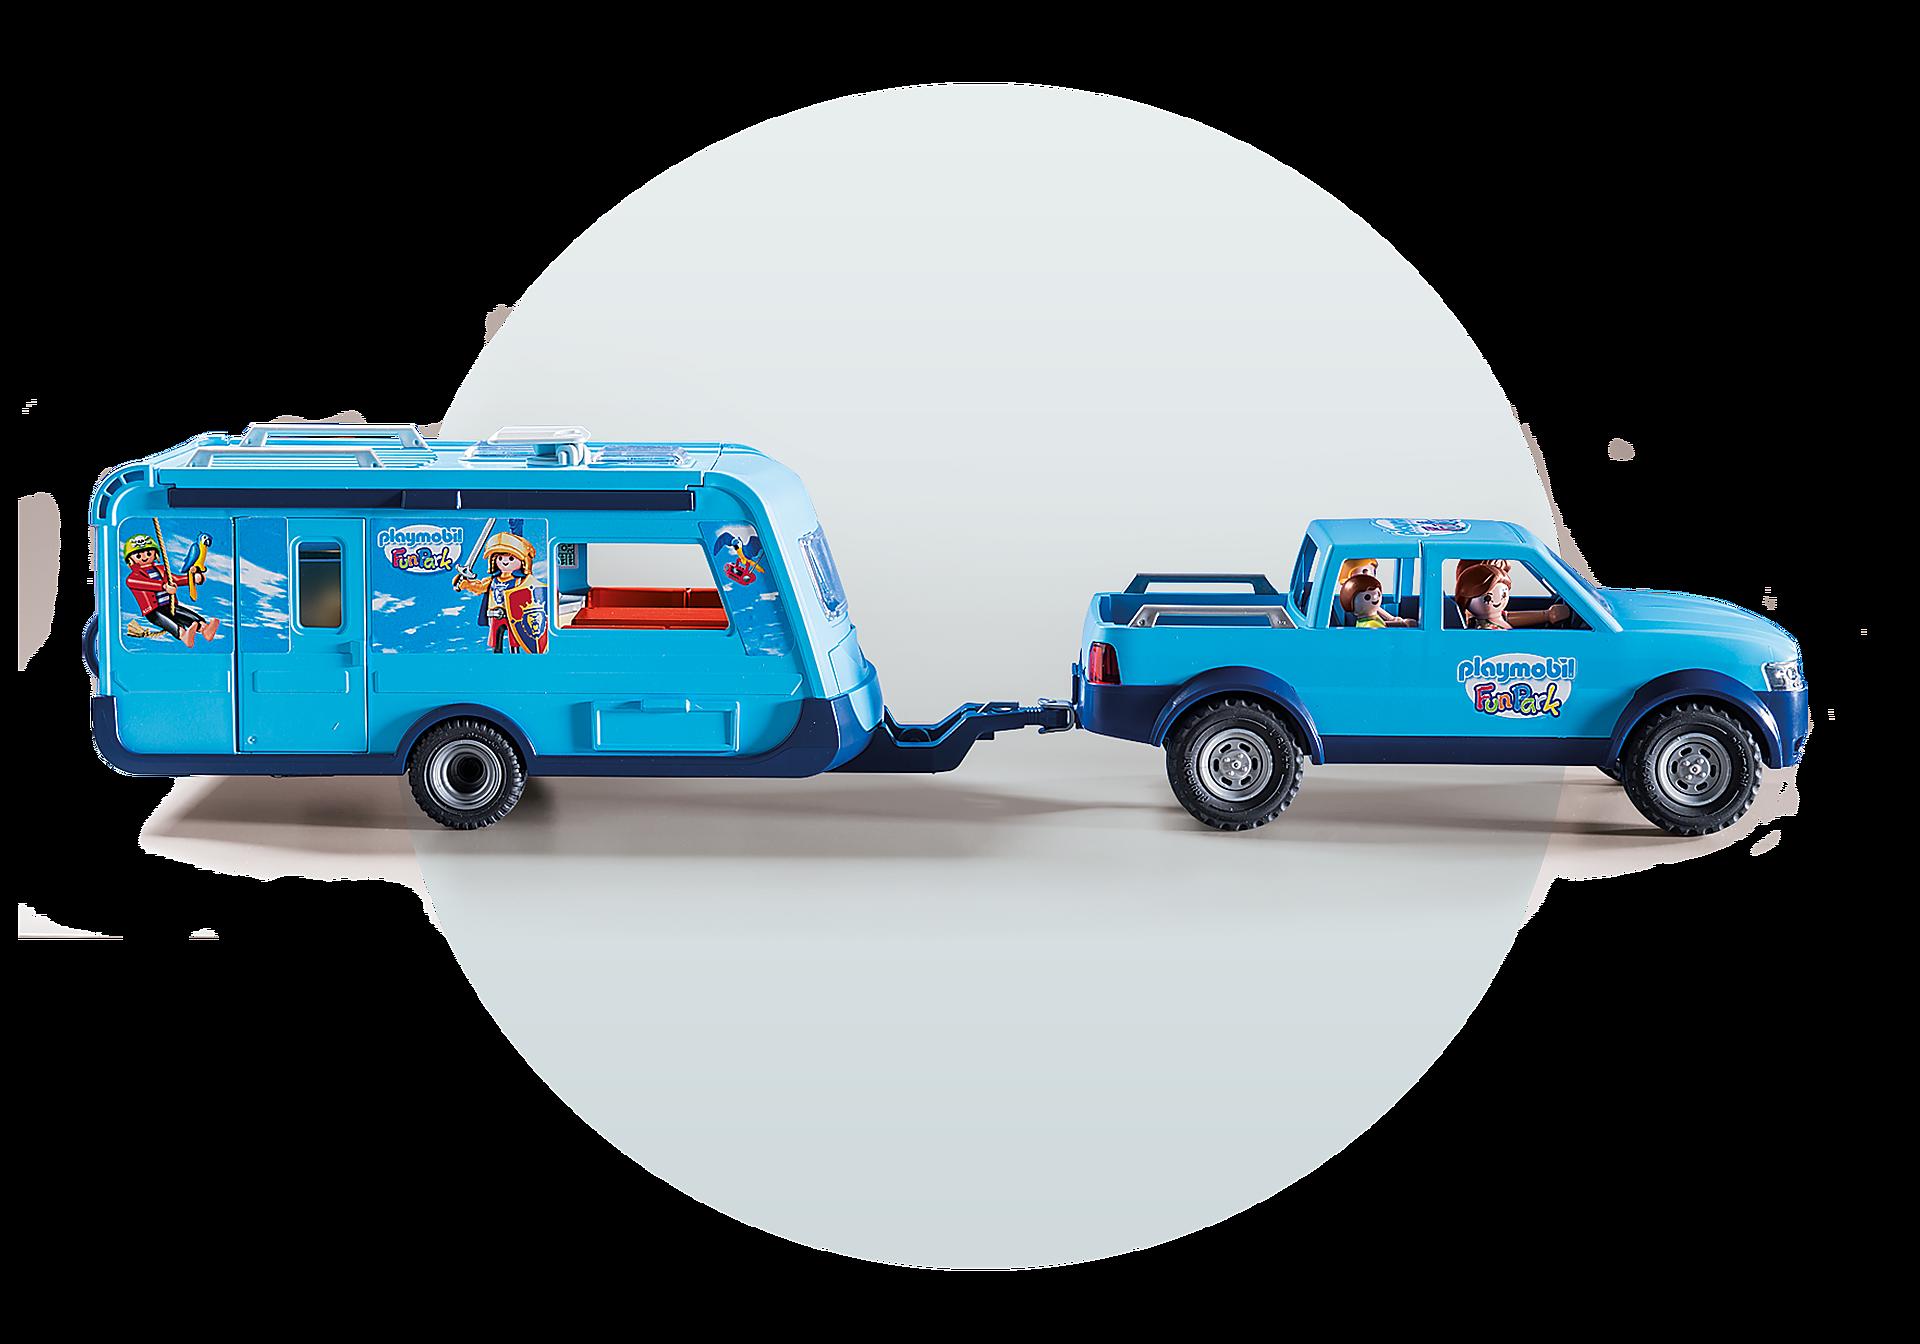 http://media.playmobil.com/i/playmobil/9502_product_extra4/Playmobil-Pick-Up mit Wohnwagen